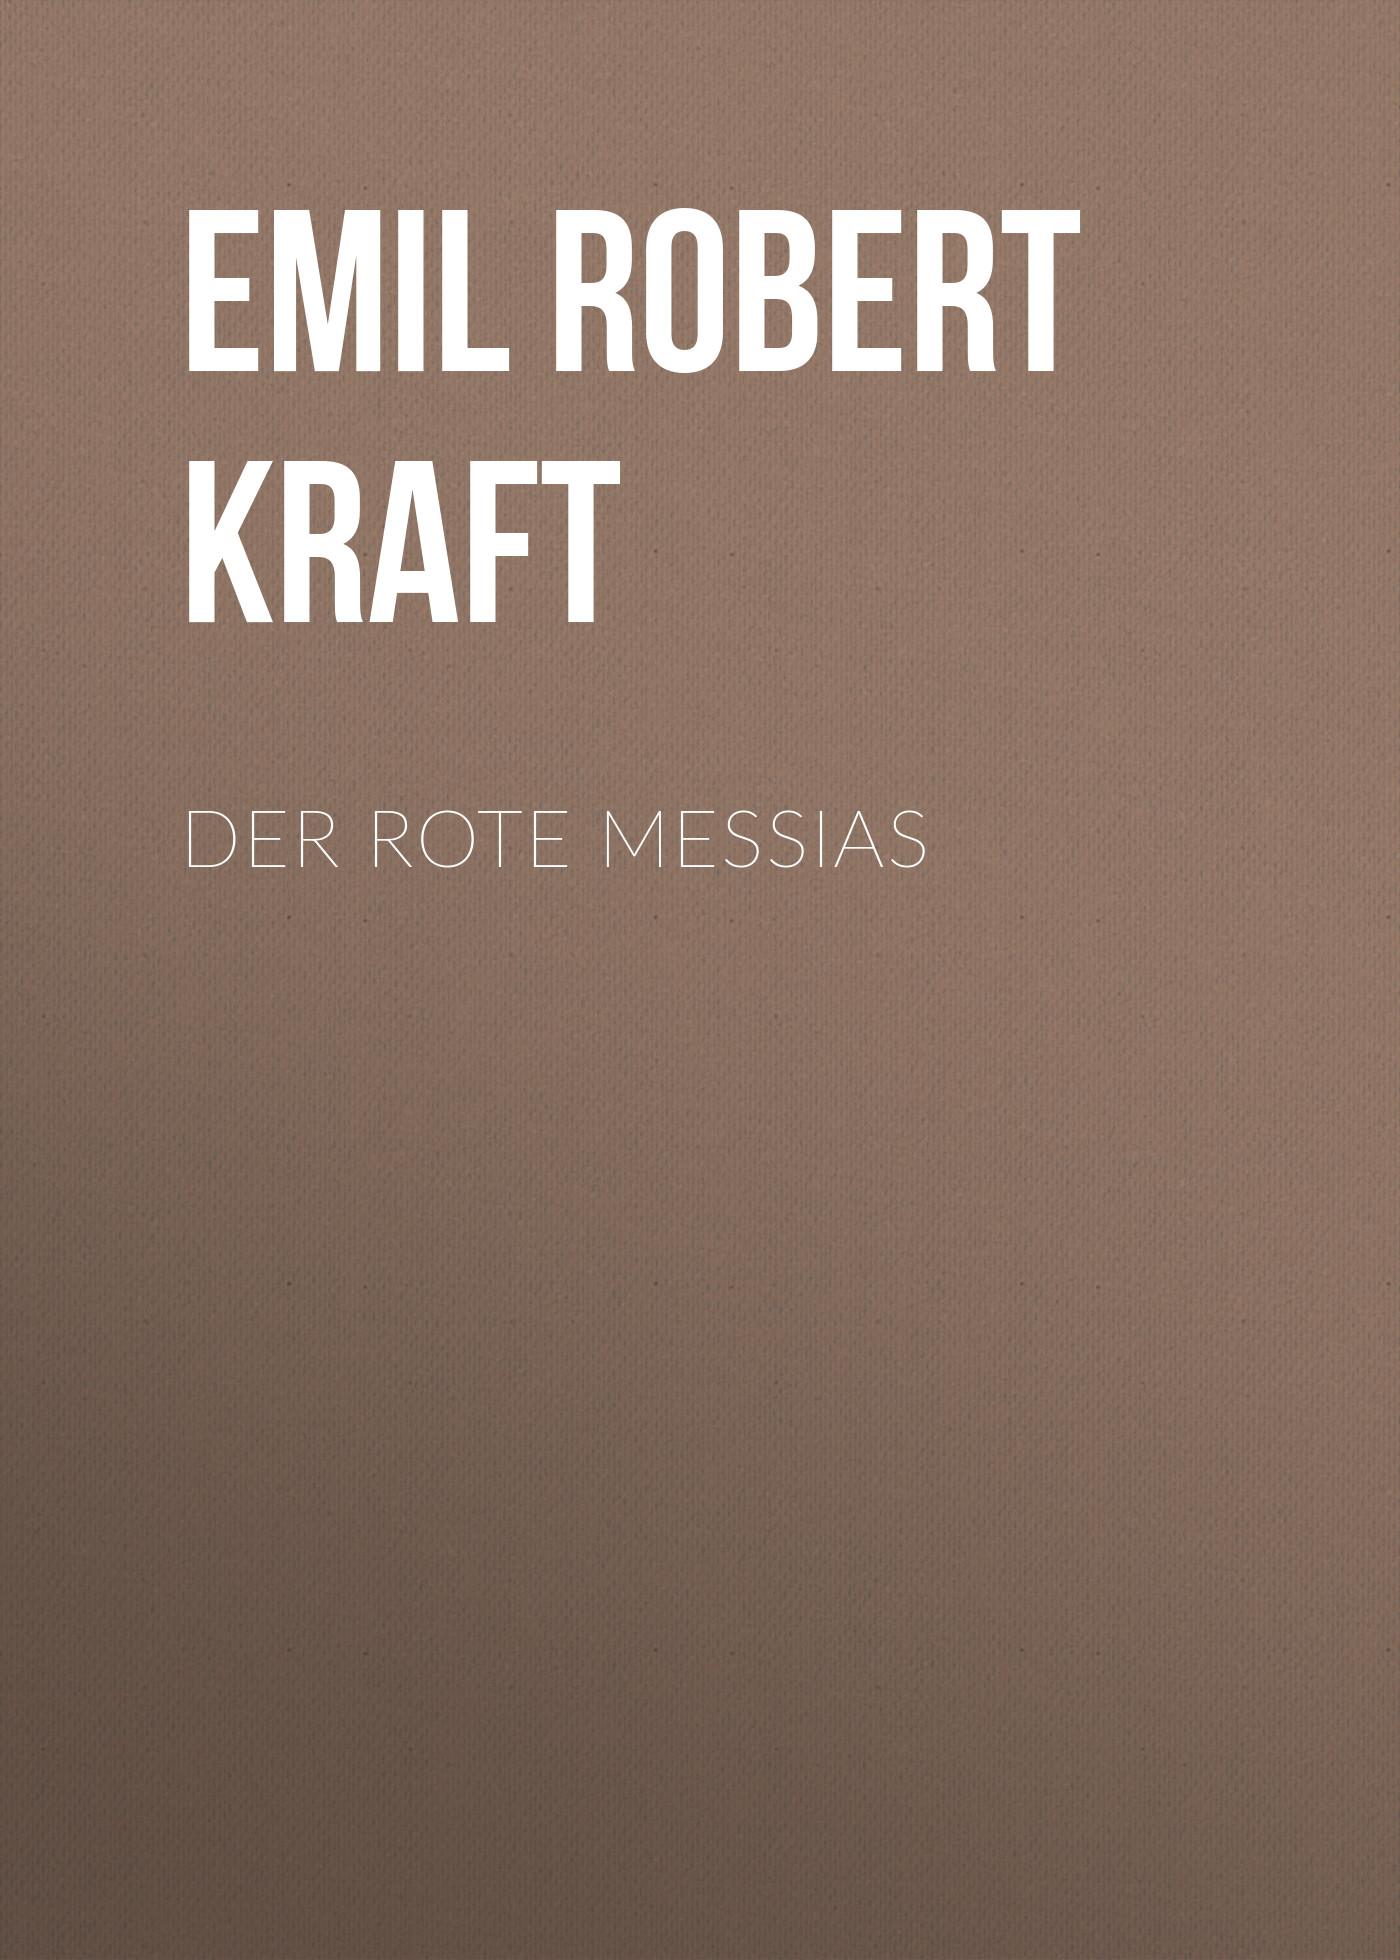 Emil Robert Kraft Der rote Messias